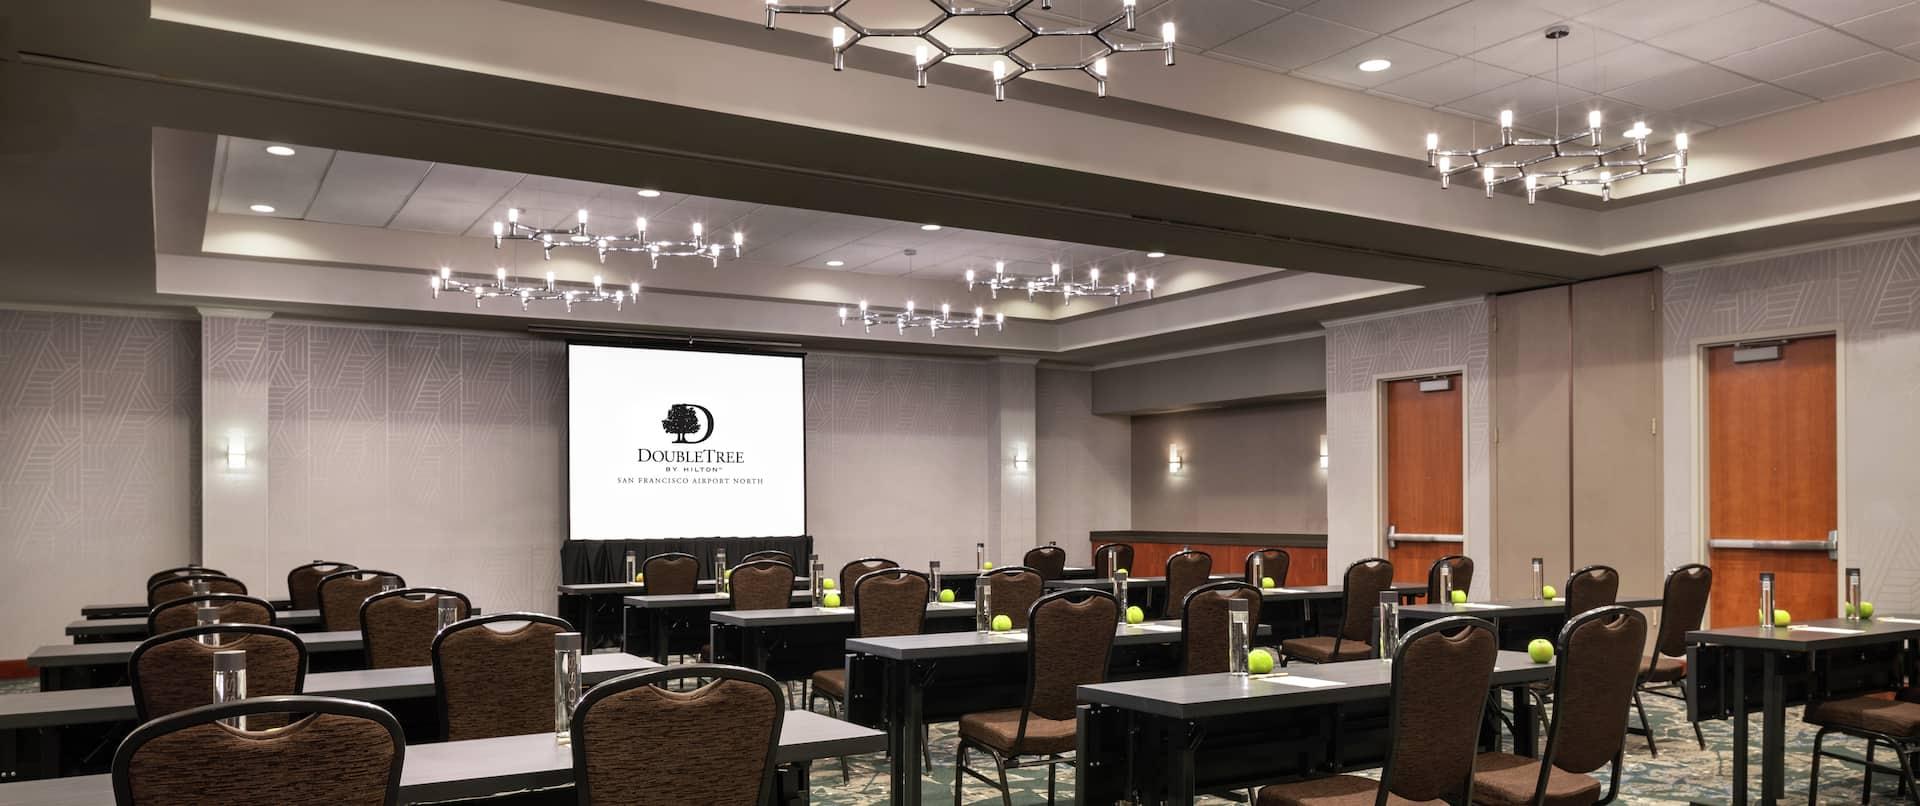 Meeting Room - Classroom Set